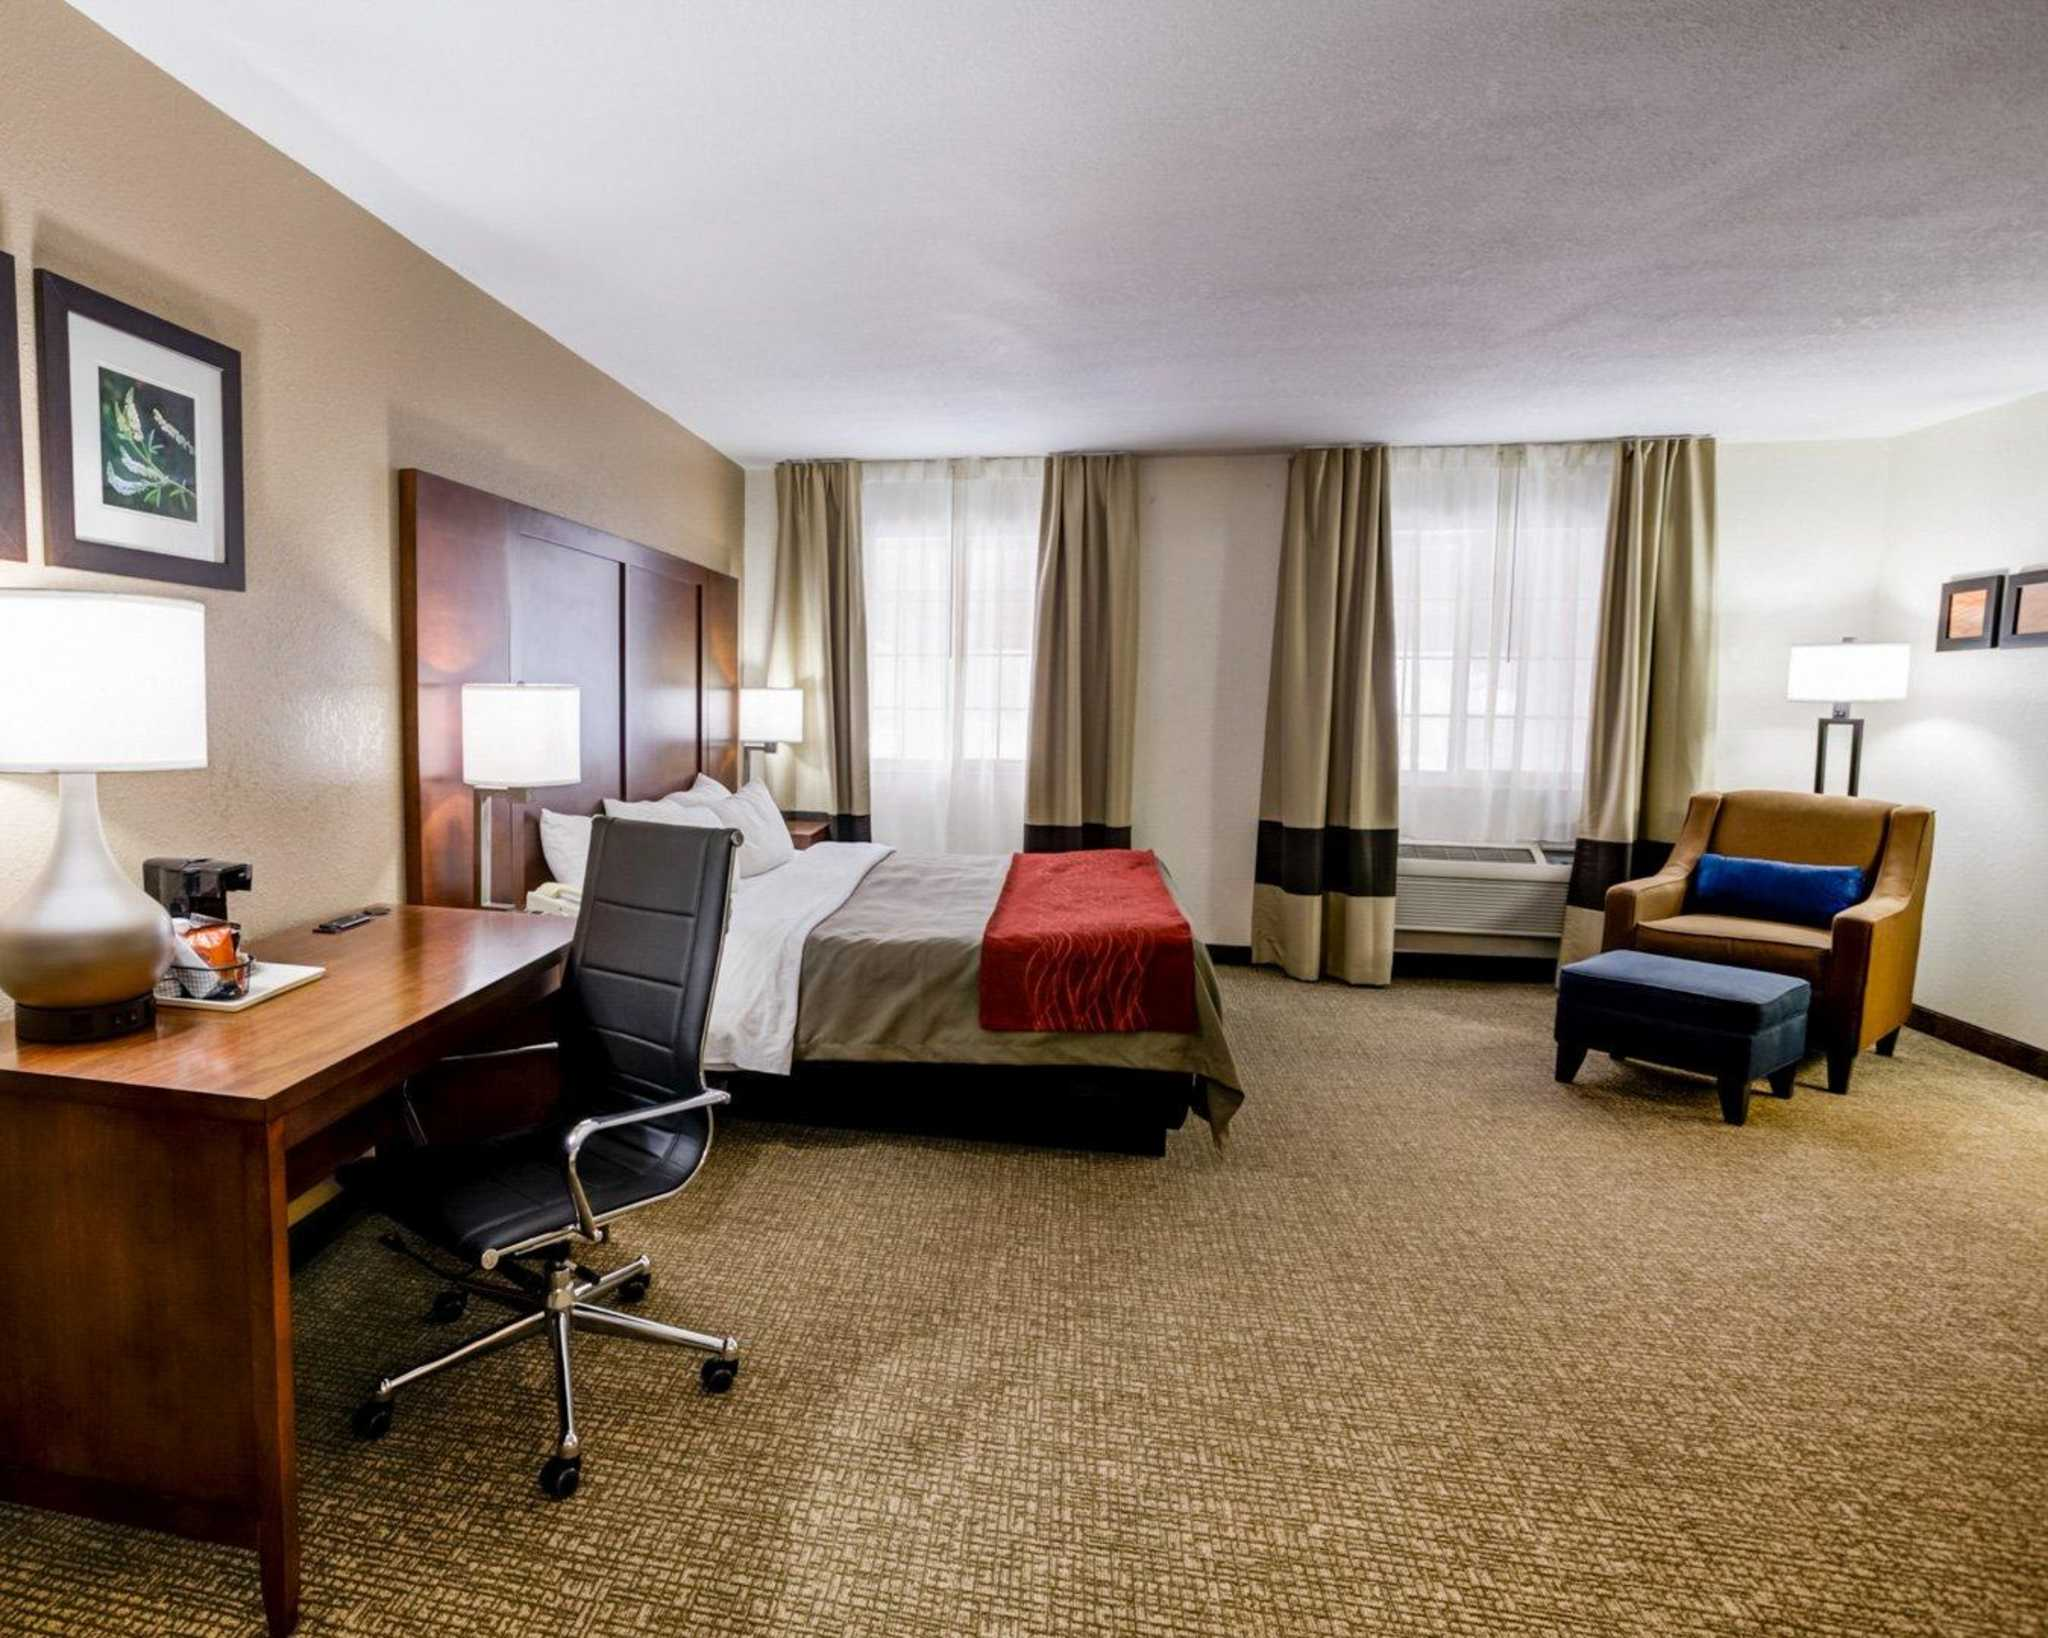 Comfort Inn Kearney - Liberty image 24